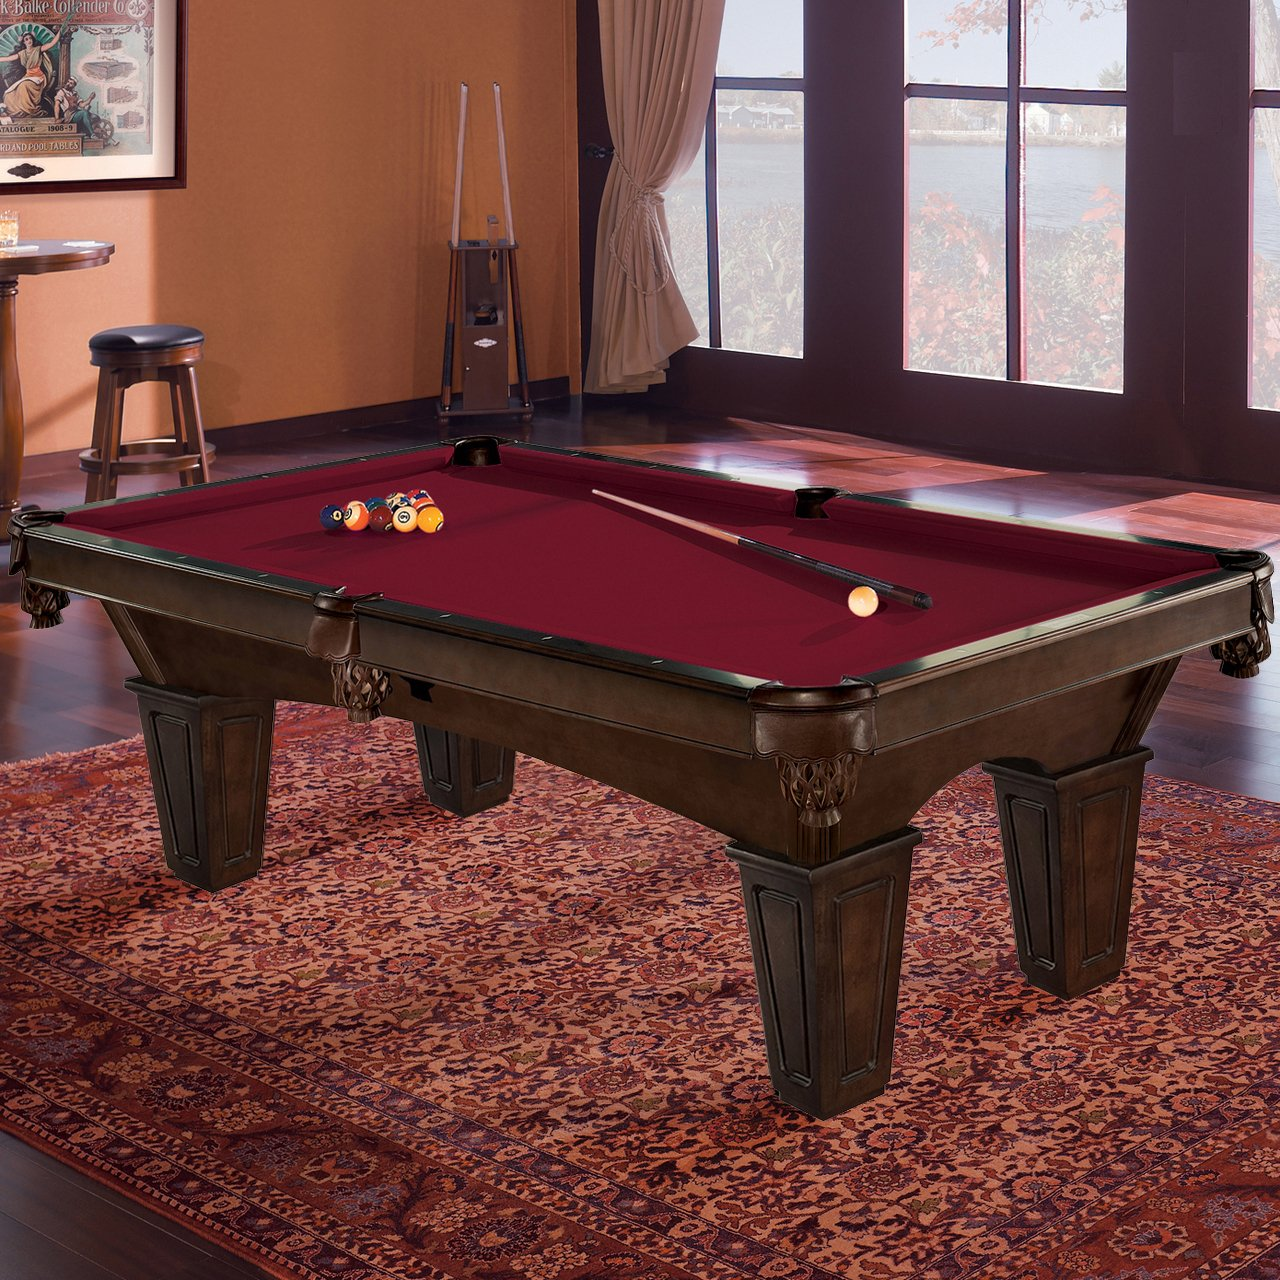 Top Best Brunswick Pool Tables In Reviews Top Best Pro Reviews - Brunswick allenton pool table